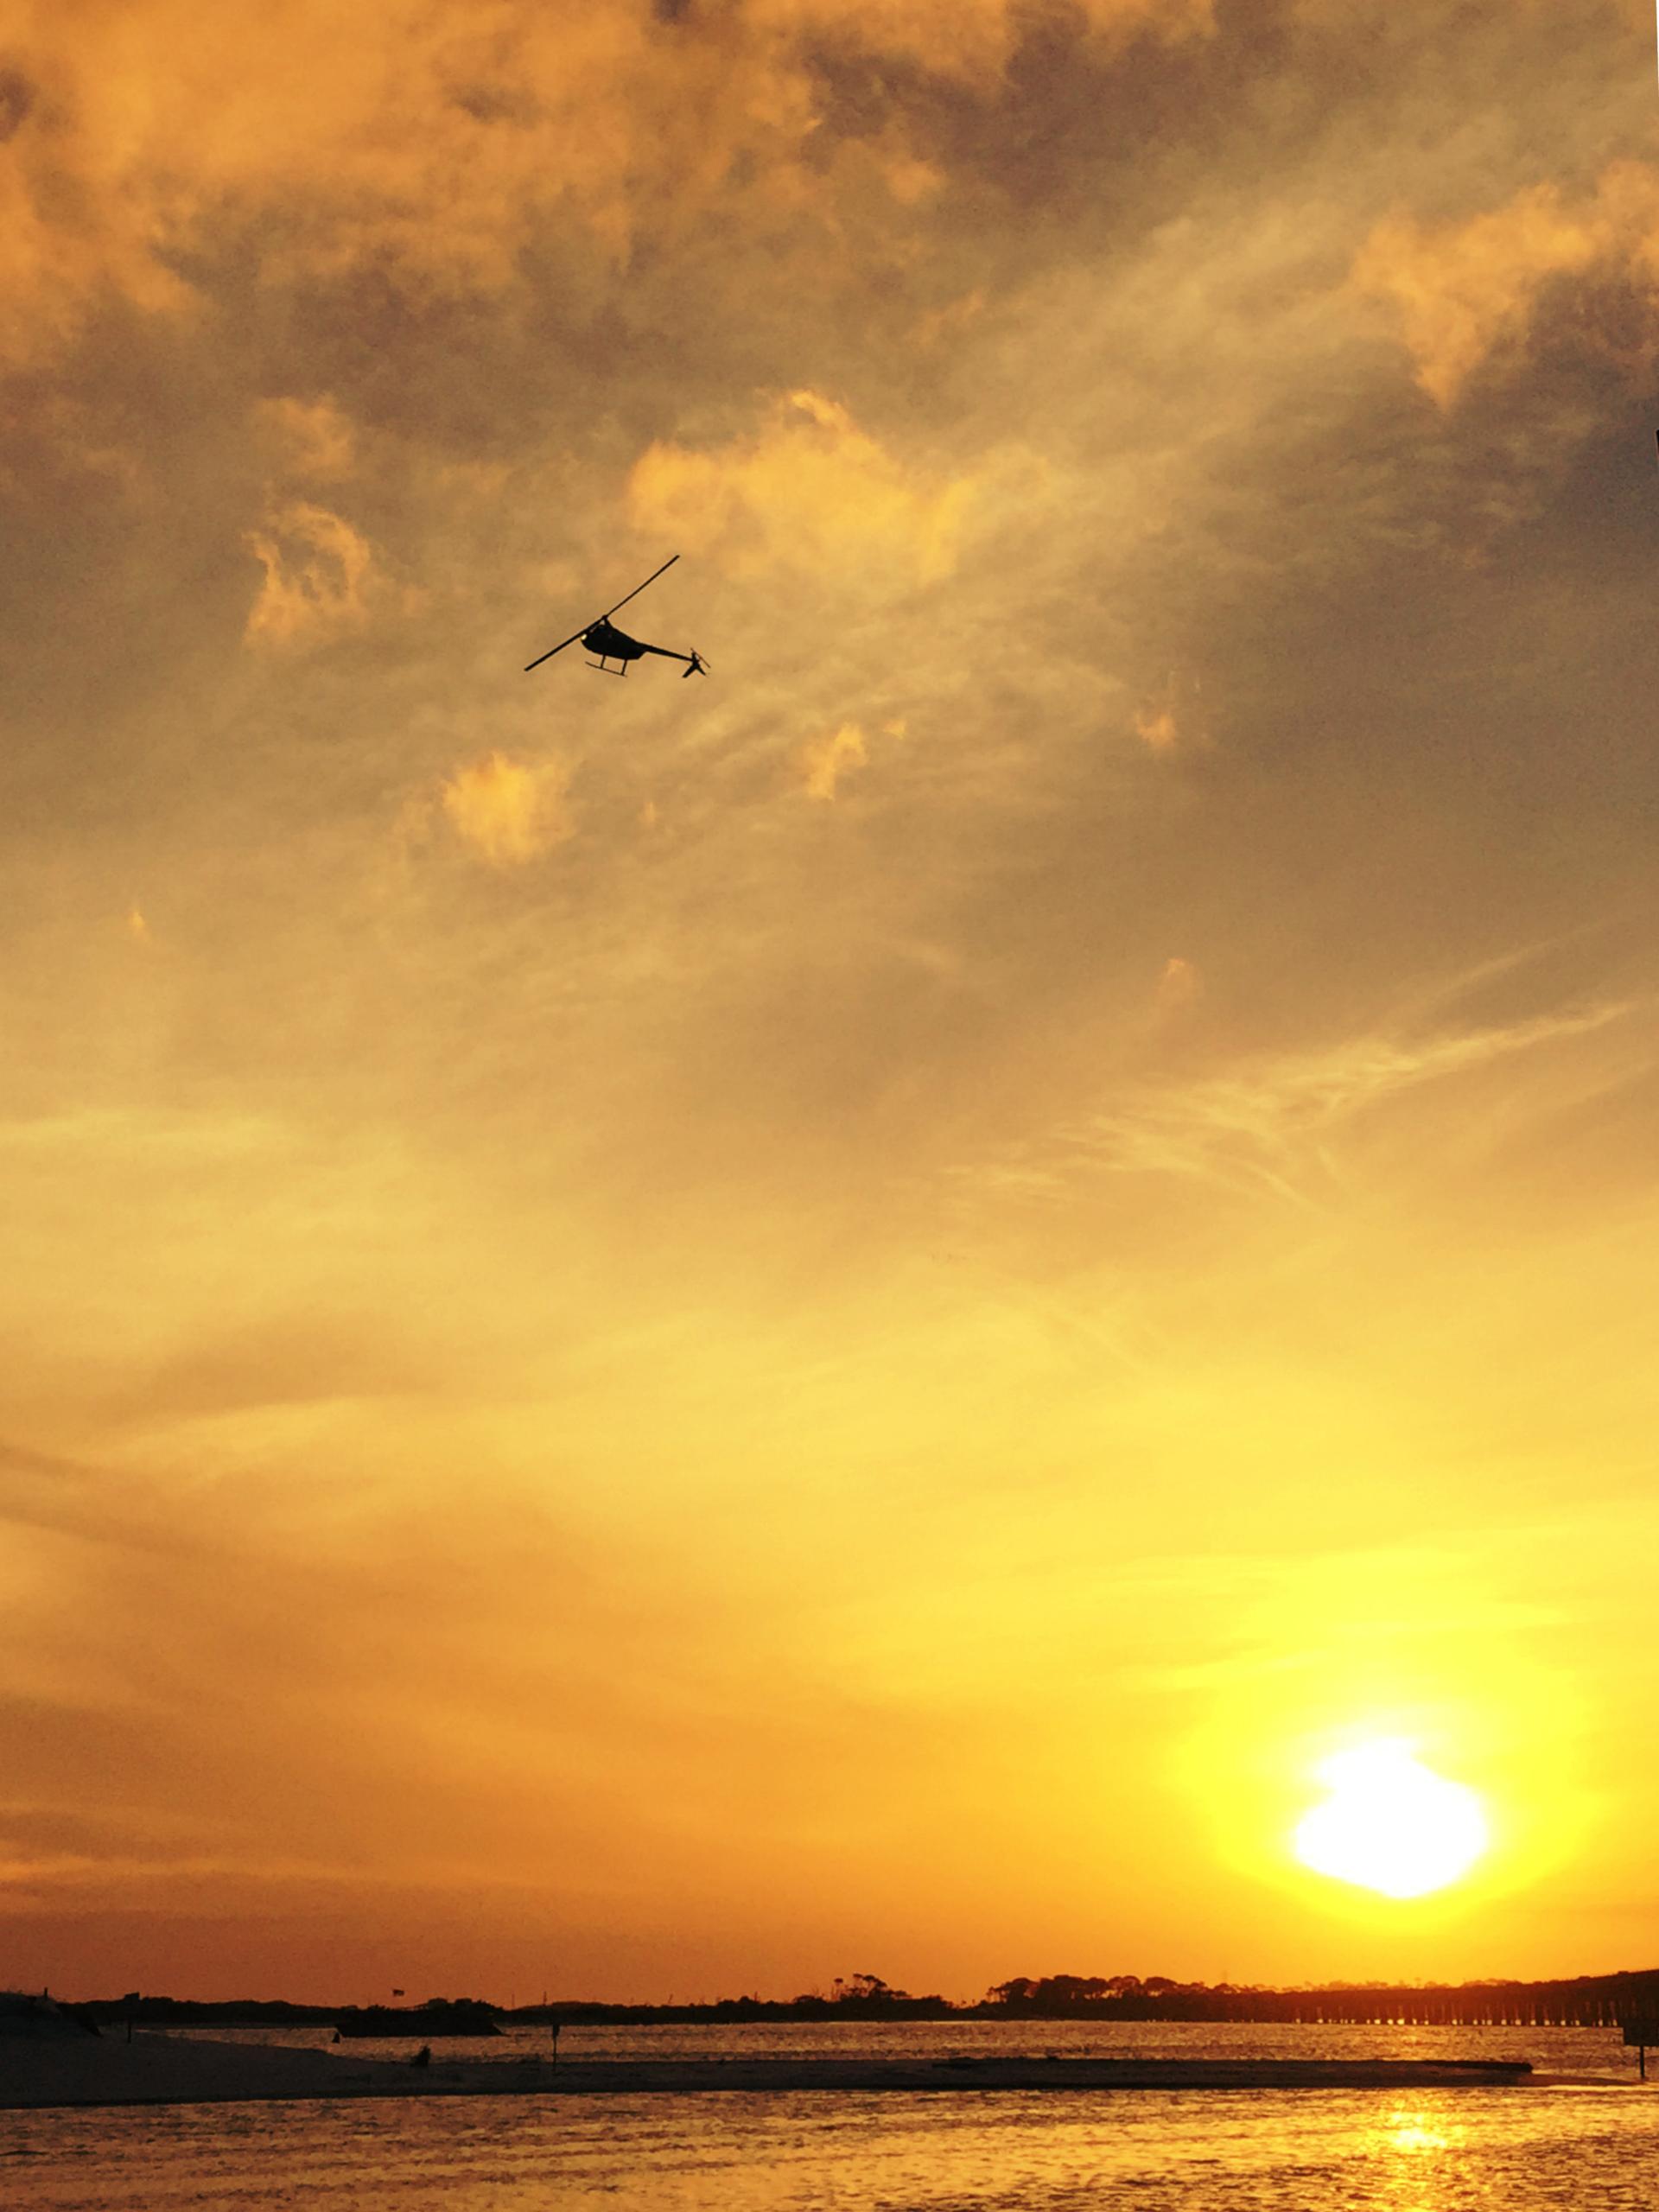 Lake against dramatic sky | airplane, lake, water, sun